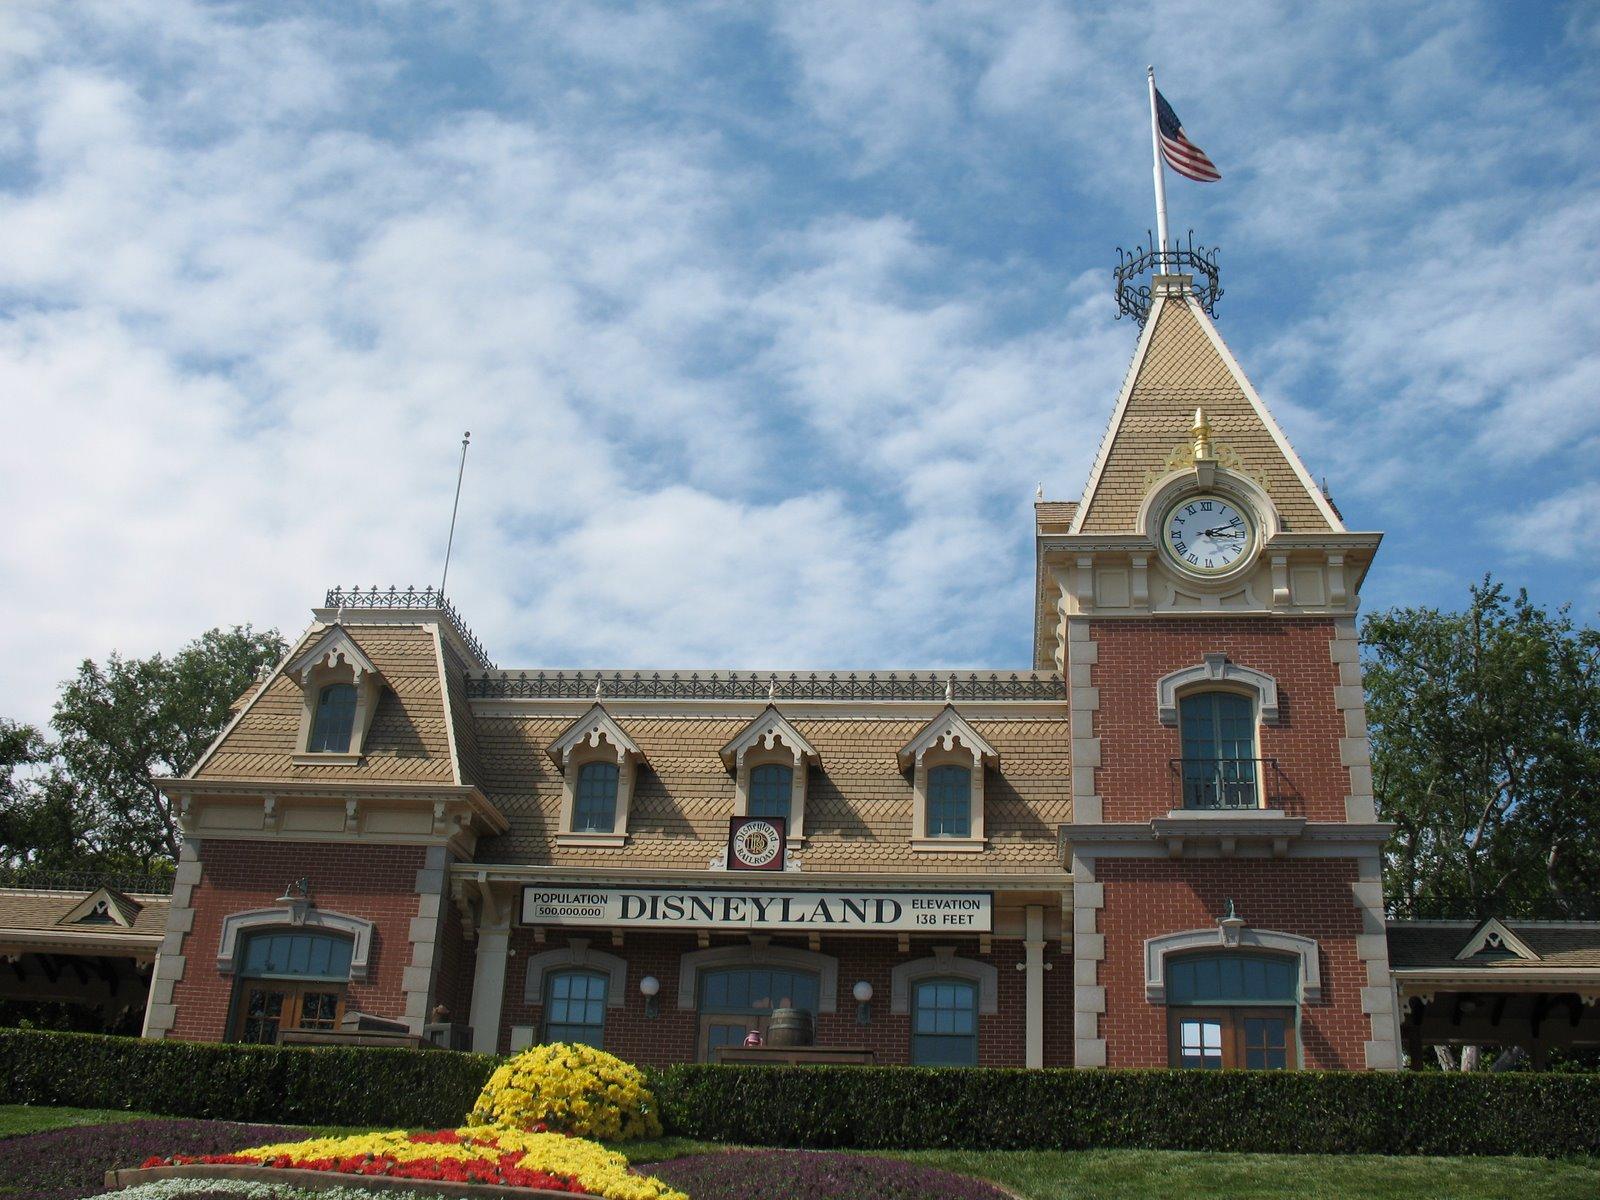 [Disneyland+2009+028.jpg]